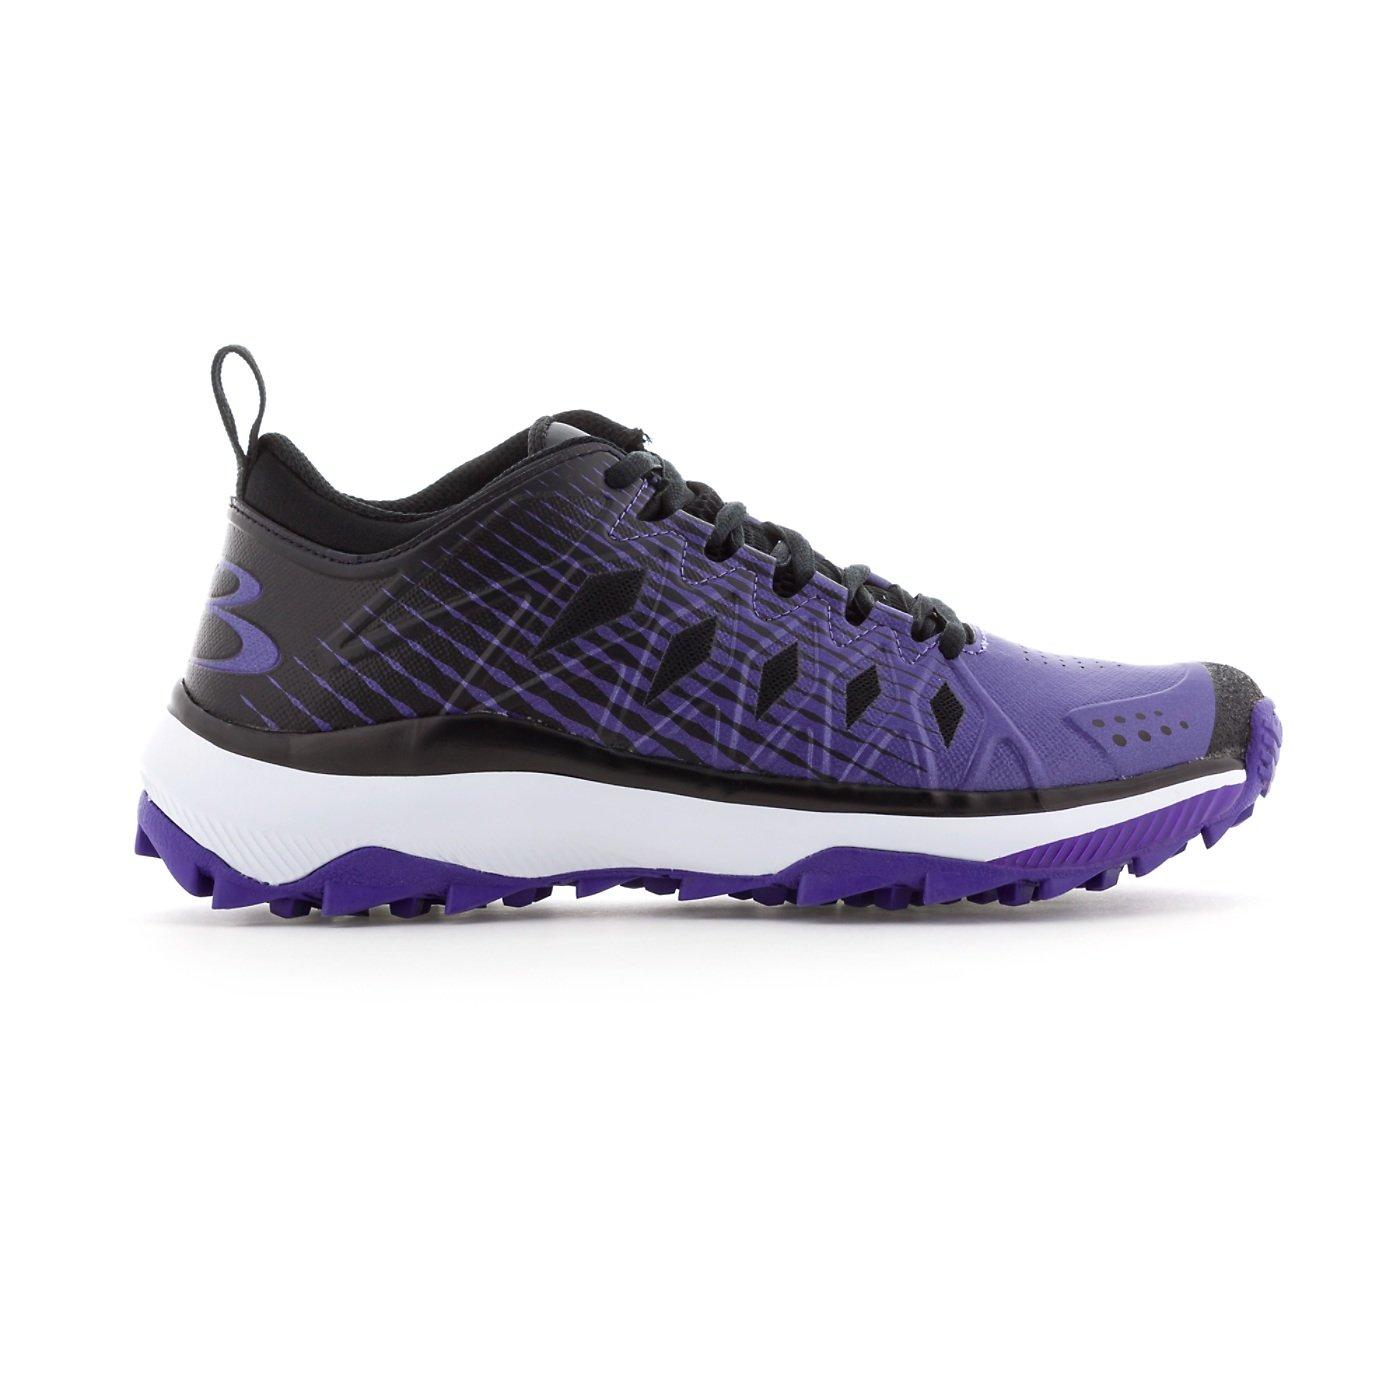 Boombah Women's Squadron Turf Shoes - 14 Color Options - Multiple Sizes B079K6QNXY 9 Black/Purple